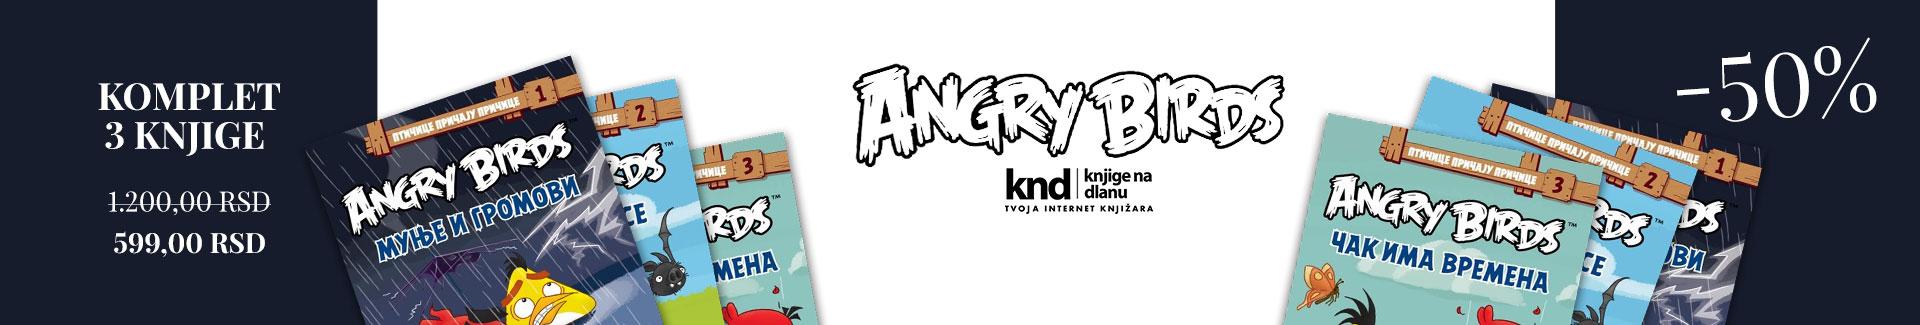 KOMPLET ANGRY BIRDS – 3 KNJIGE ZA 599